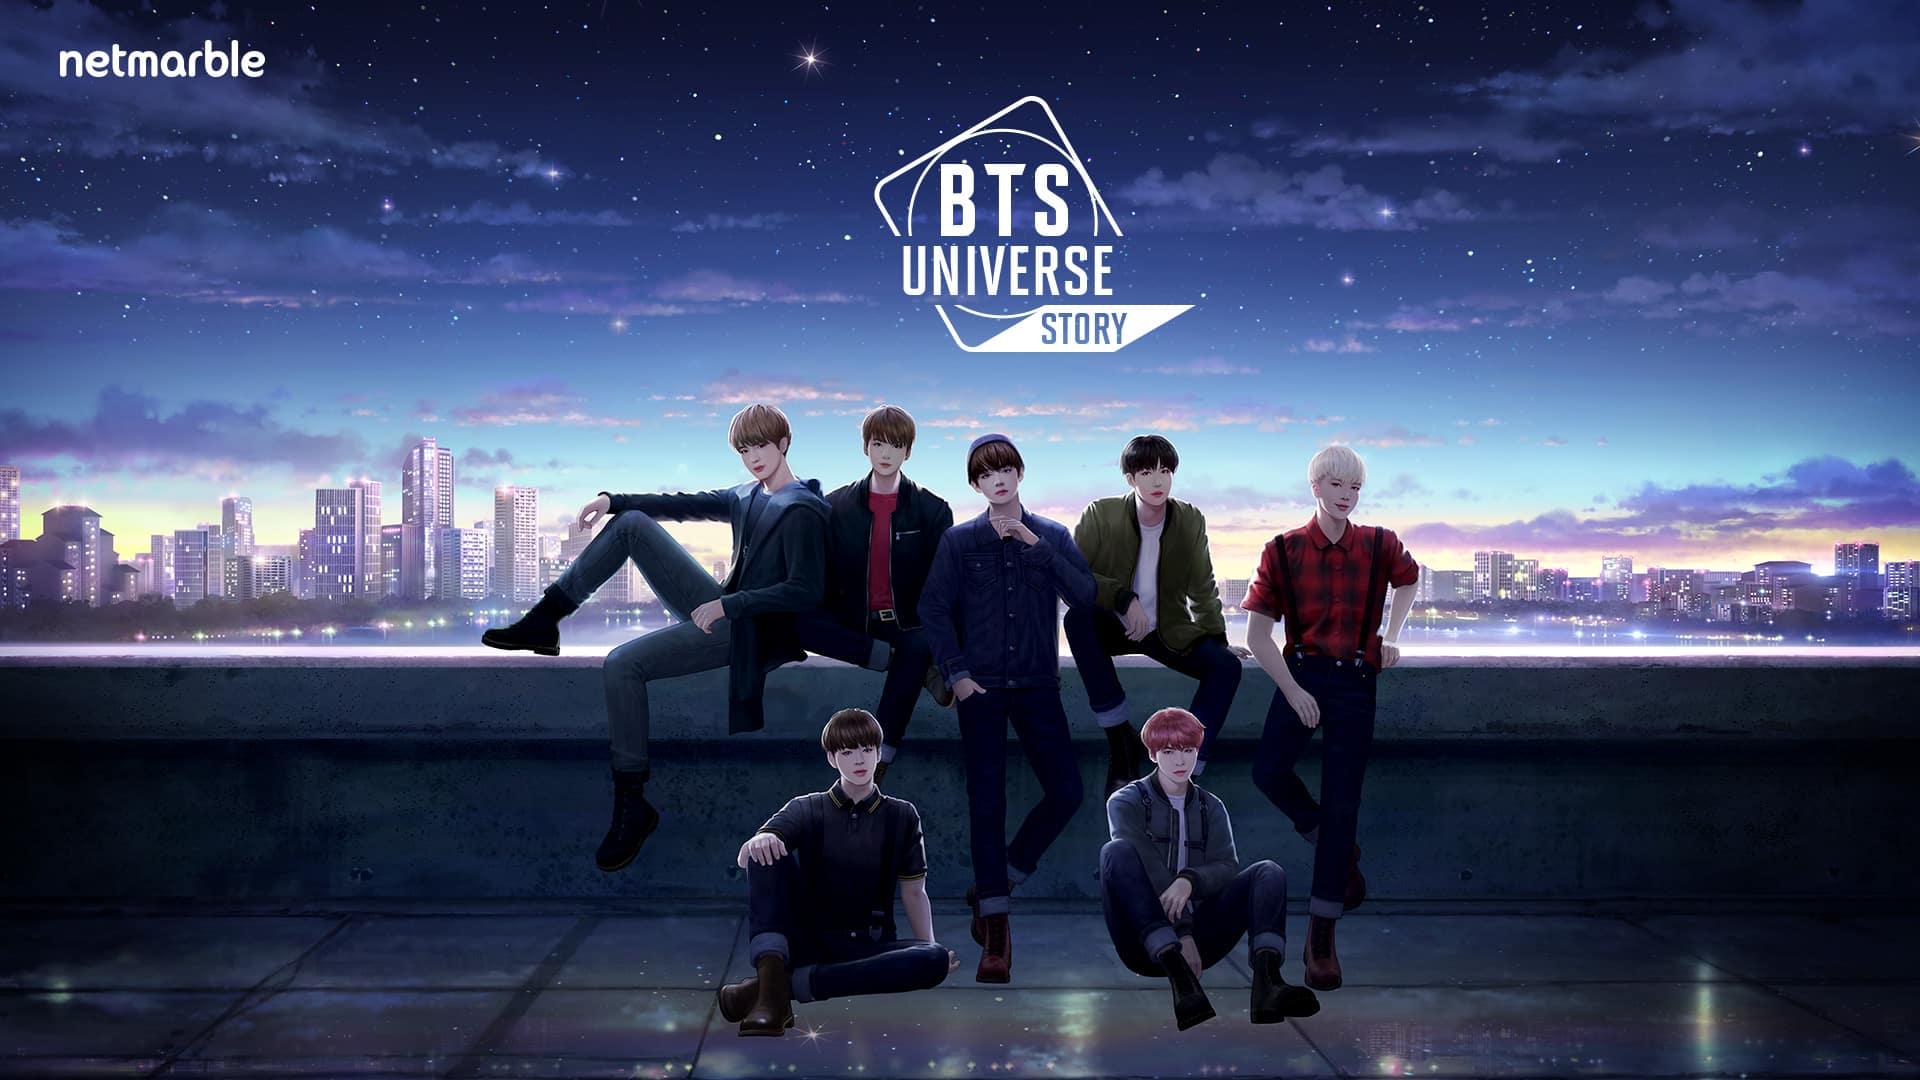 تحميل لعبة BTS Universe Story مجانا وبرابط مباشر